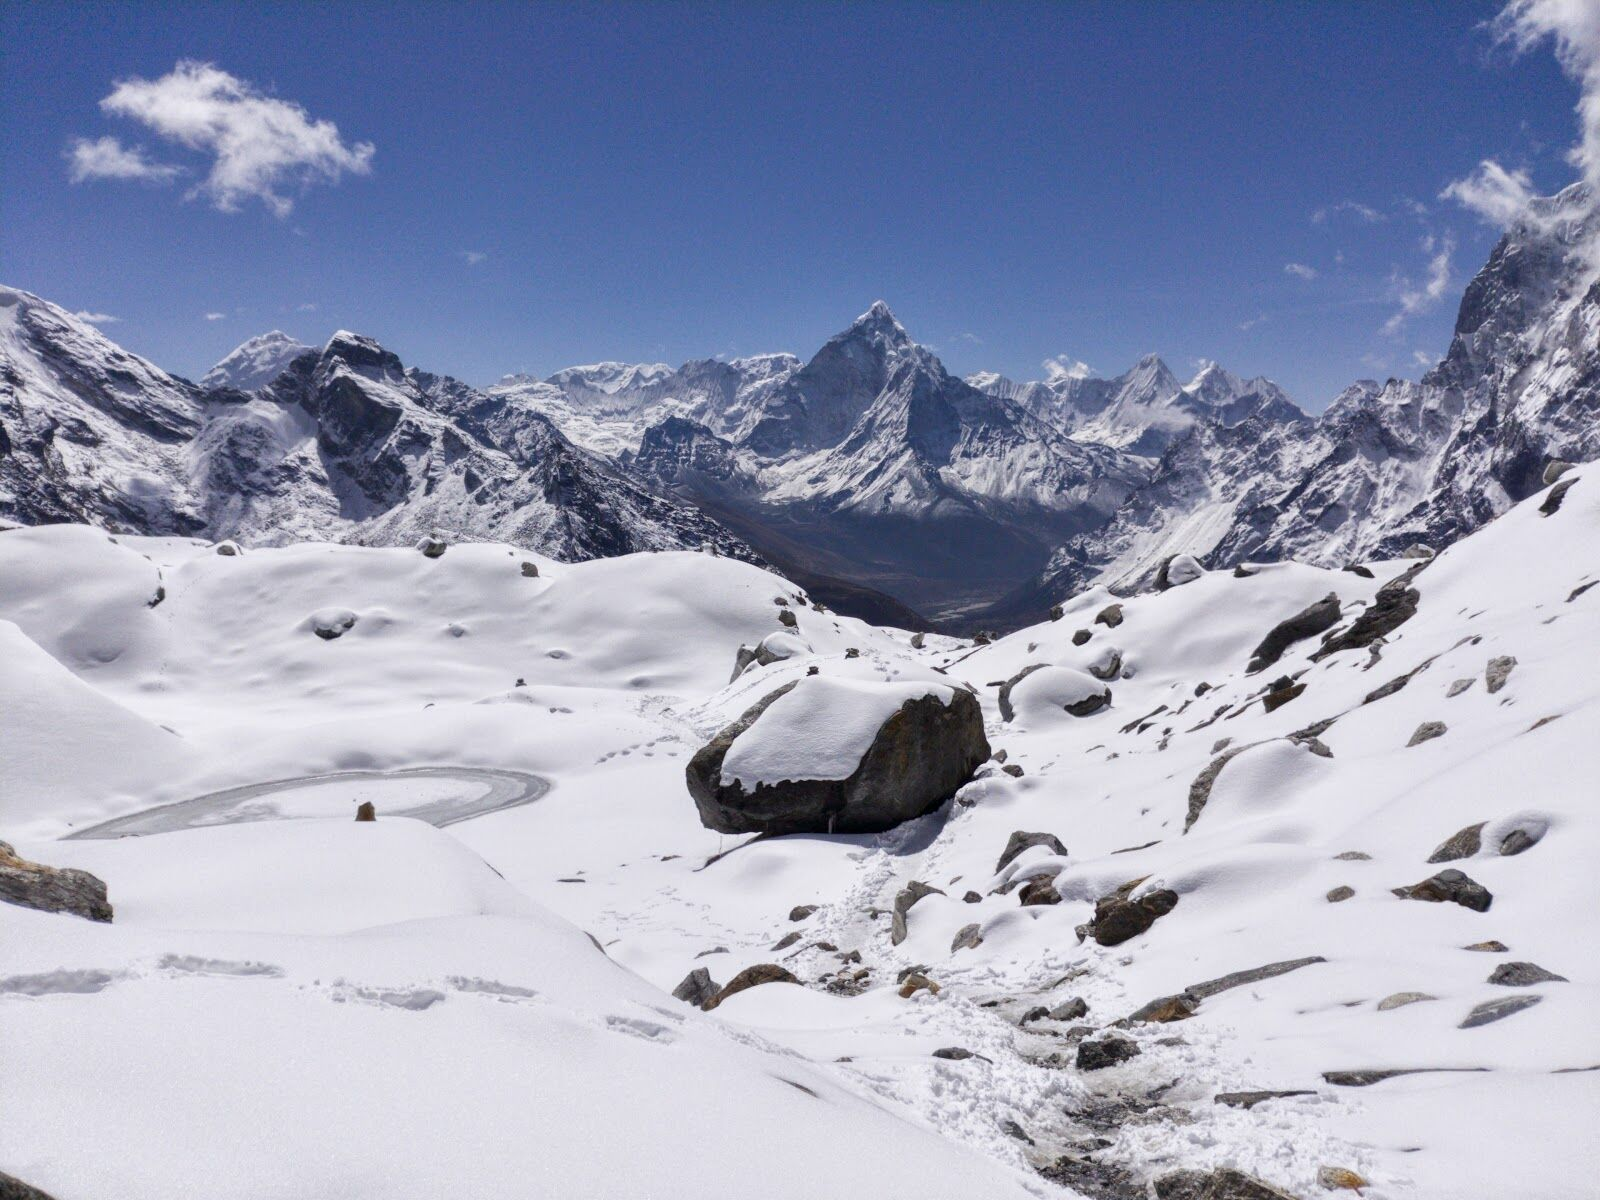 Регион Эвереста, Непал. 5 400 м